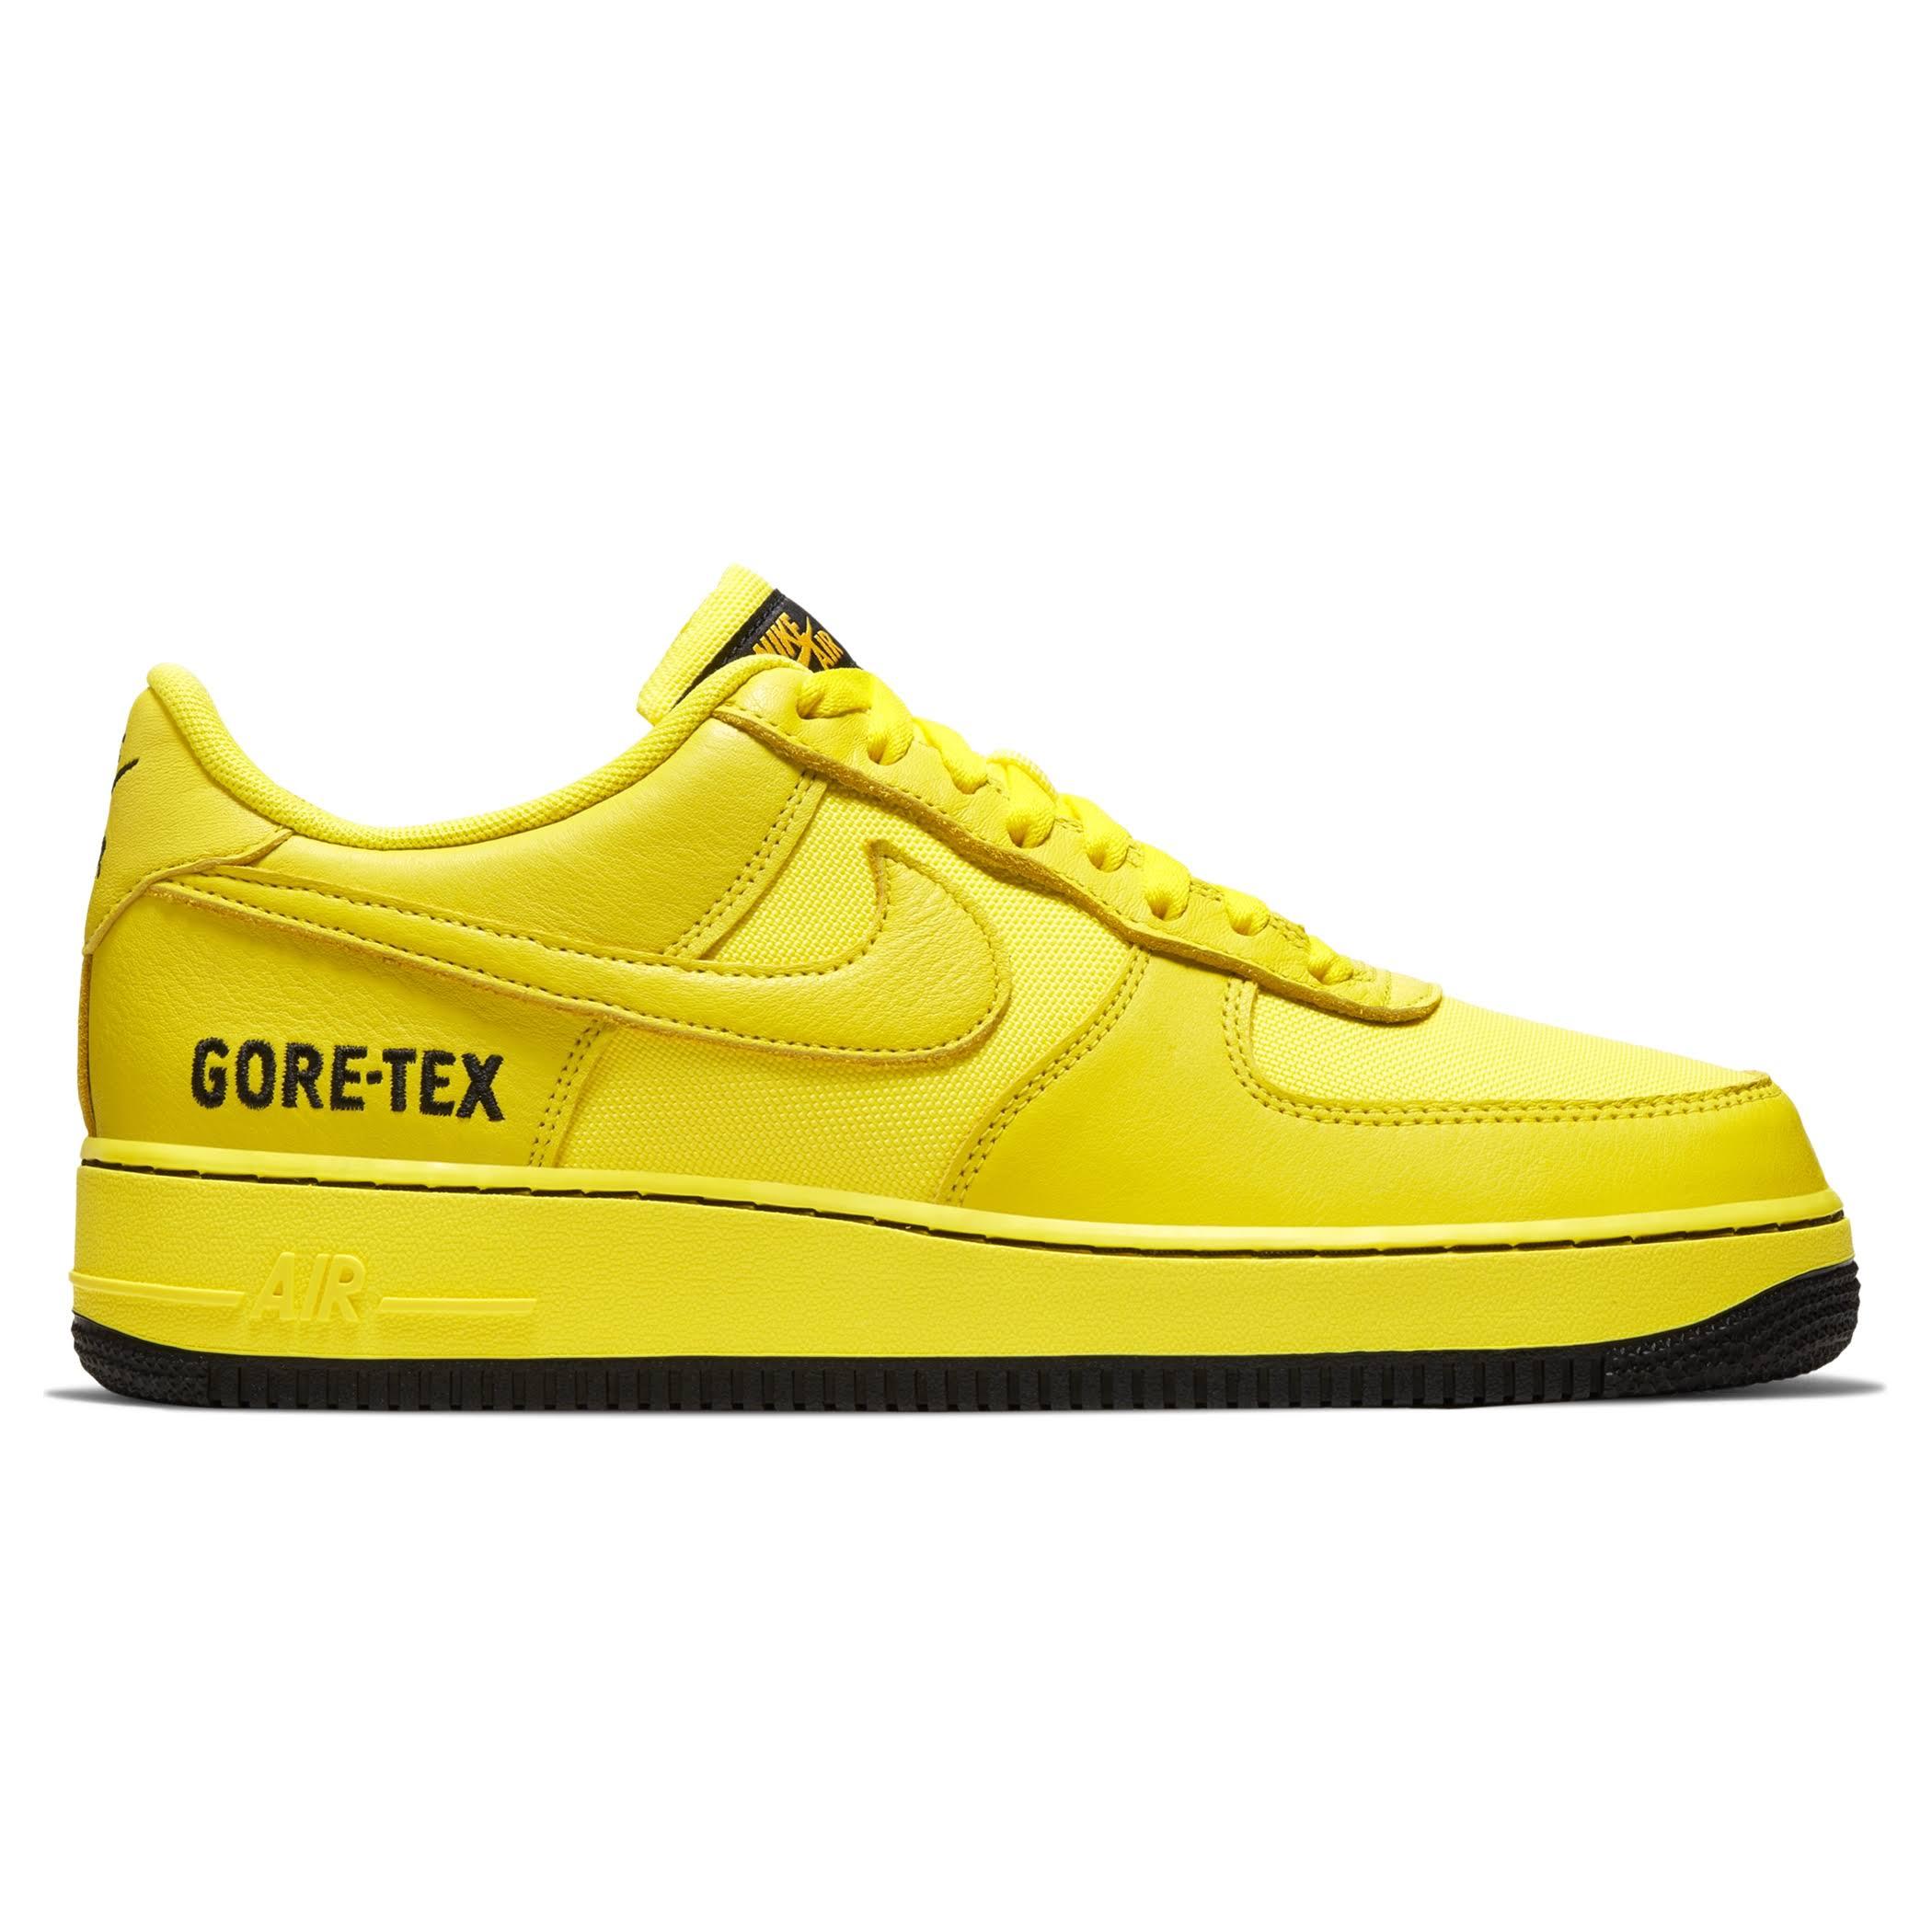 Nike Air Force 1 Gore-Tex, Yellow